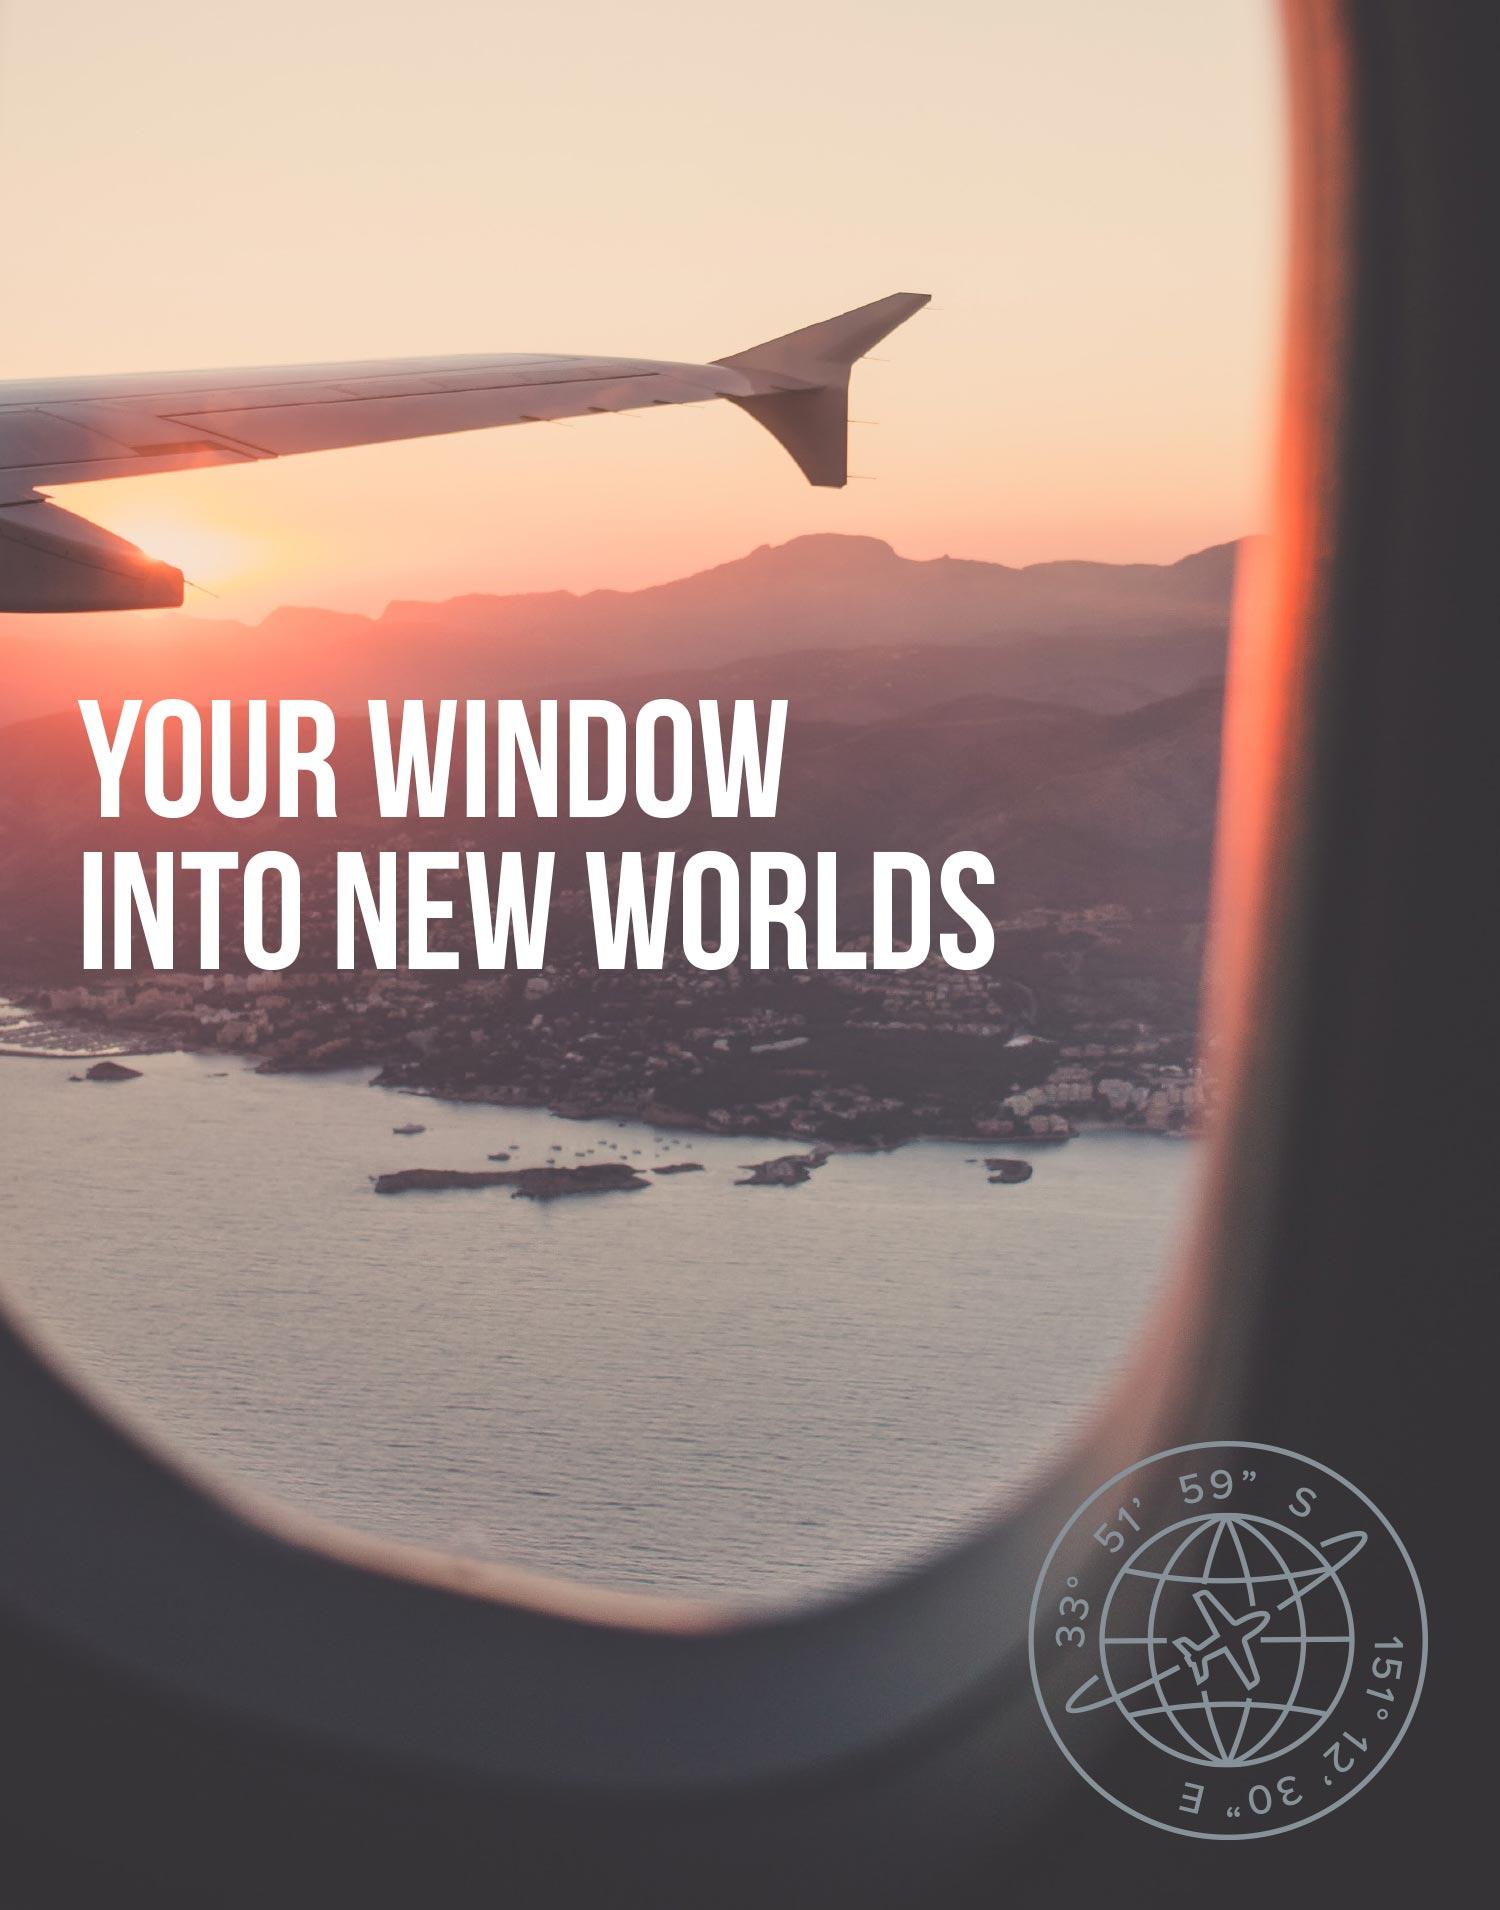 gilton-valeo-windows.jpg